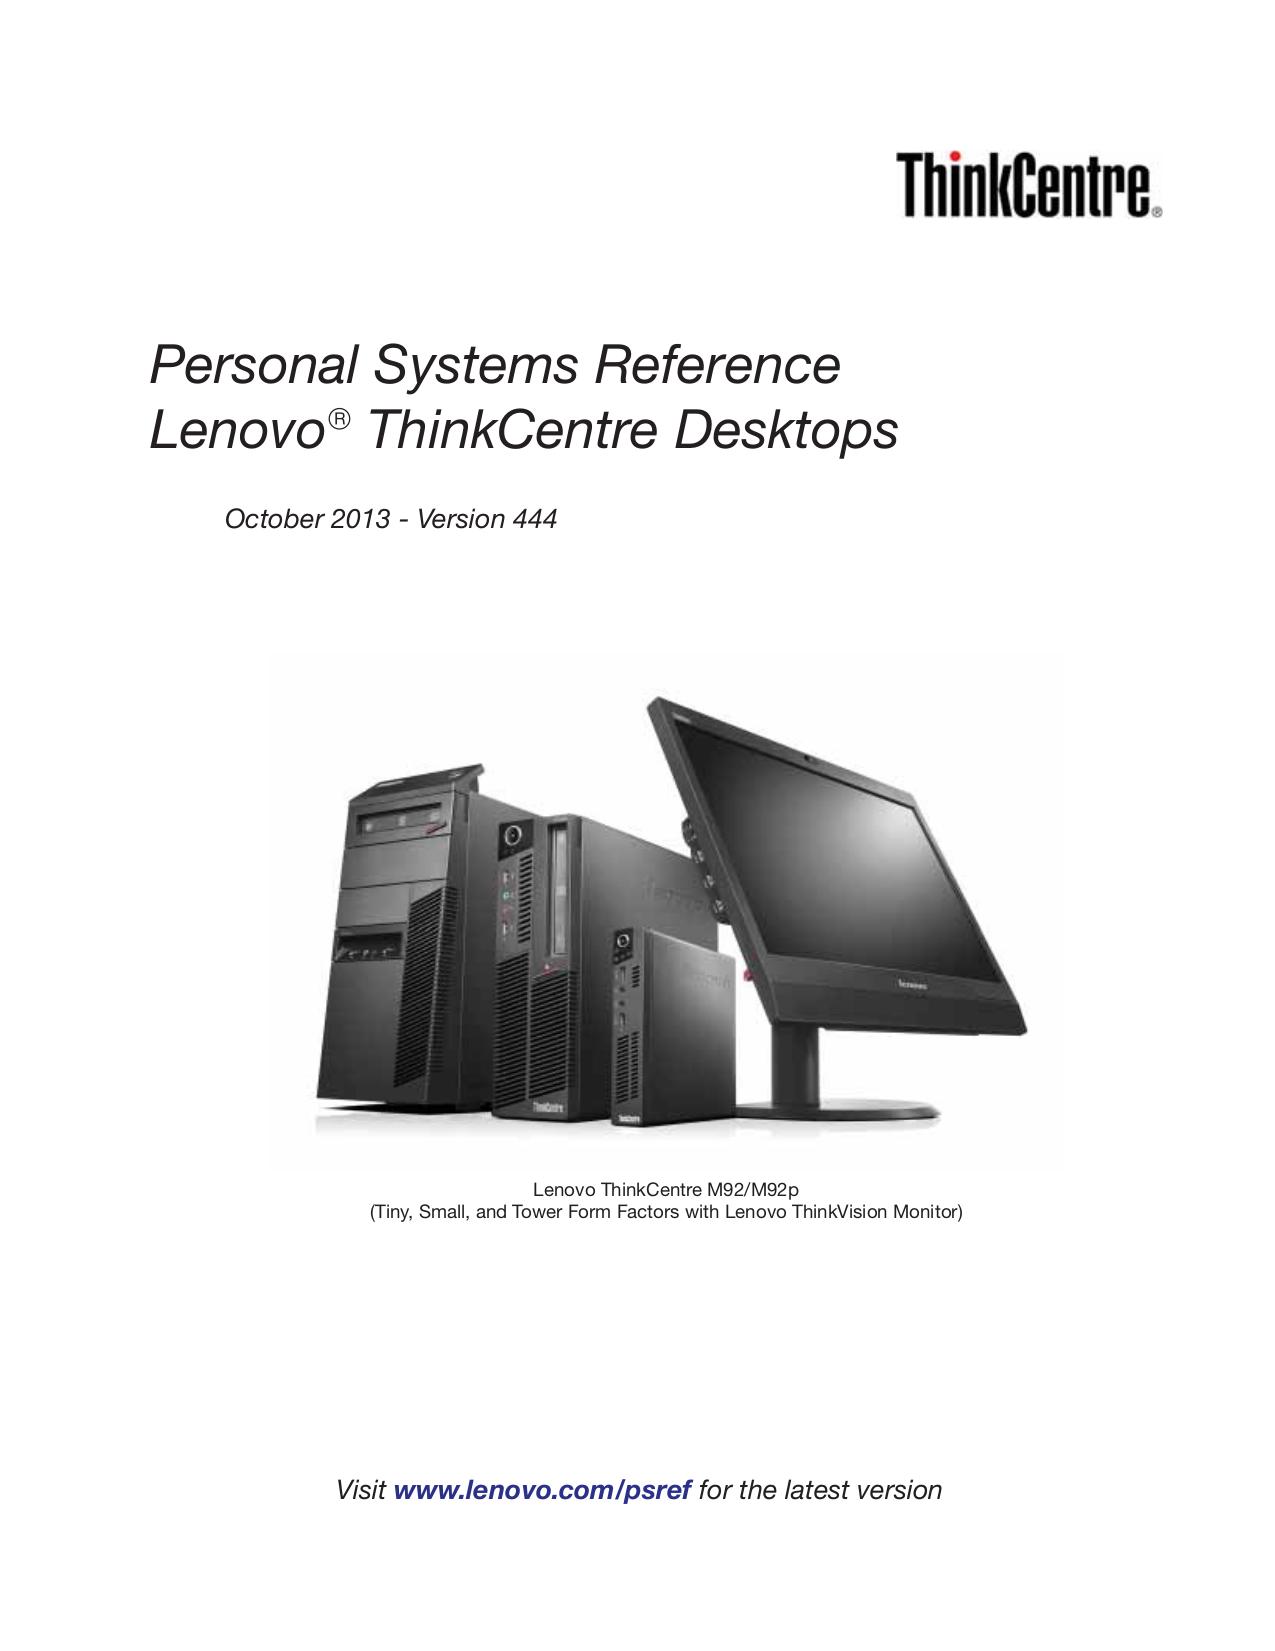 pdf for Lenovo Desktop ThinkCentre M91p 4480 manual